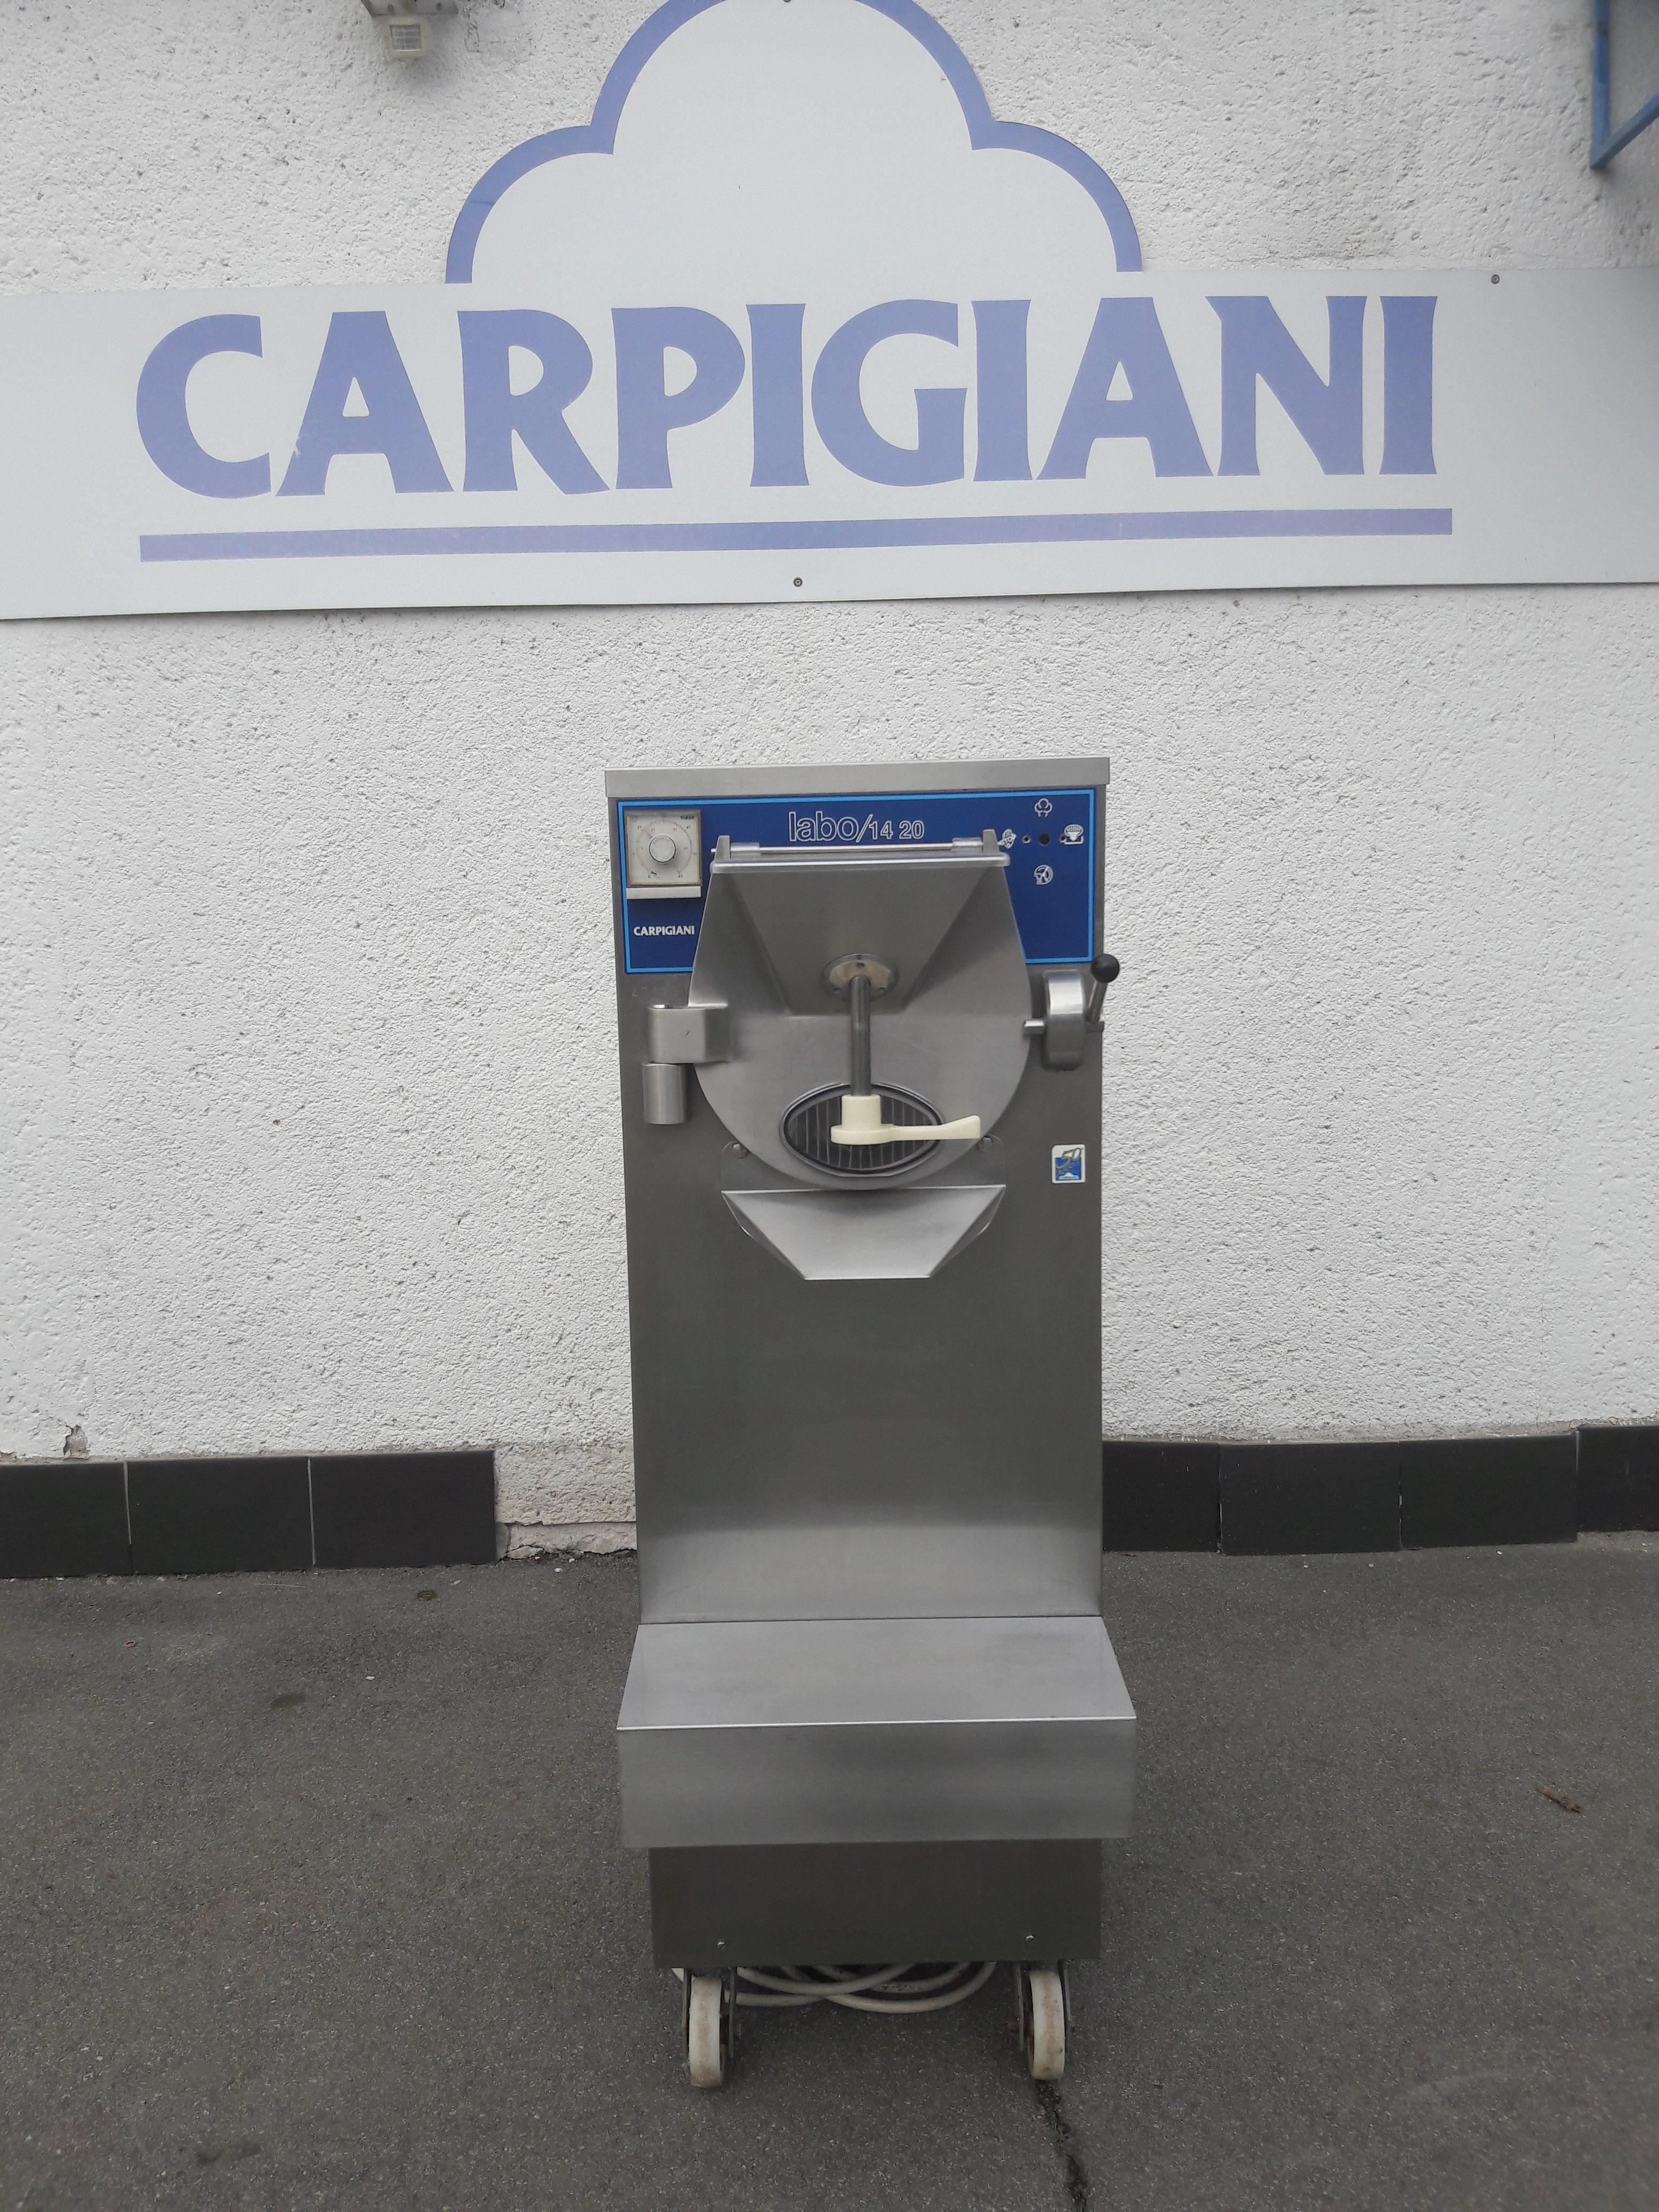 Carpigiani Labo 14 20 C